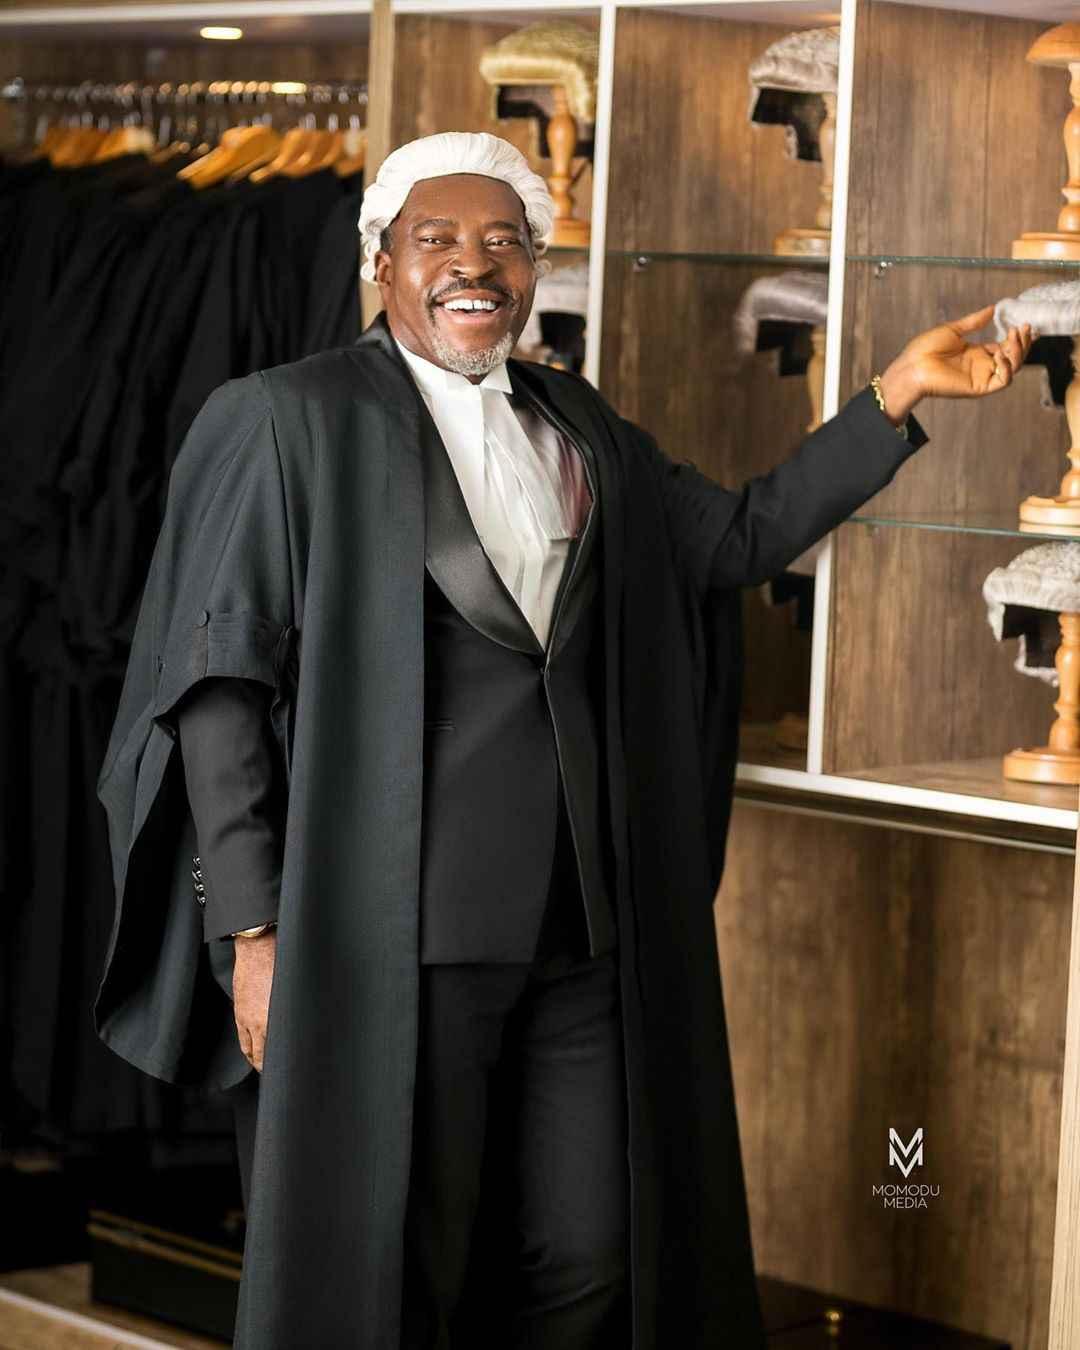 Nigerian Movies: Actor Kanayo O. Kanayo Now a Full Time Lawyer at 58 (Photos) 2